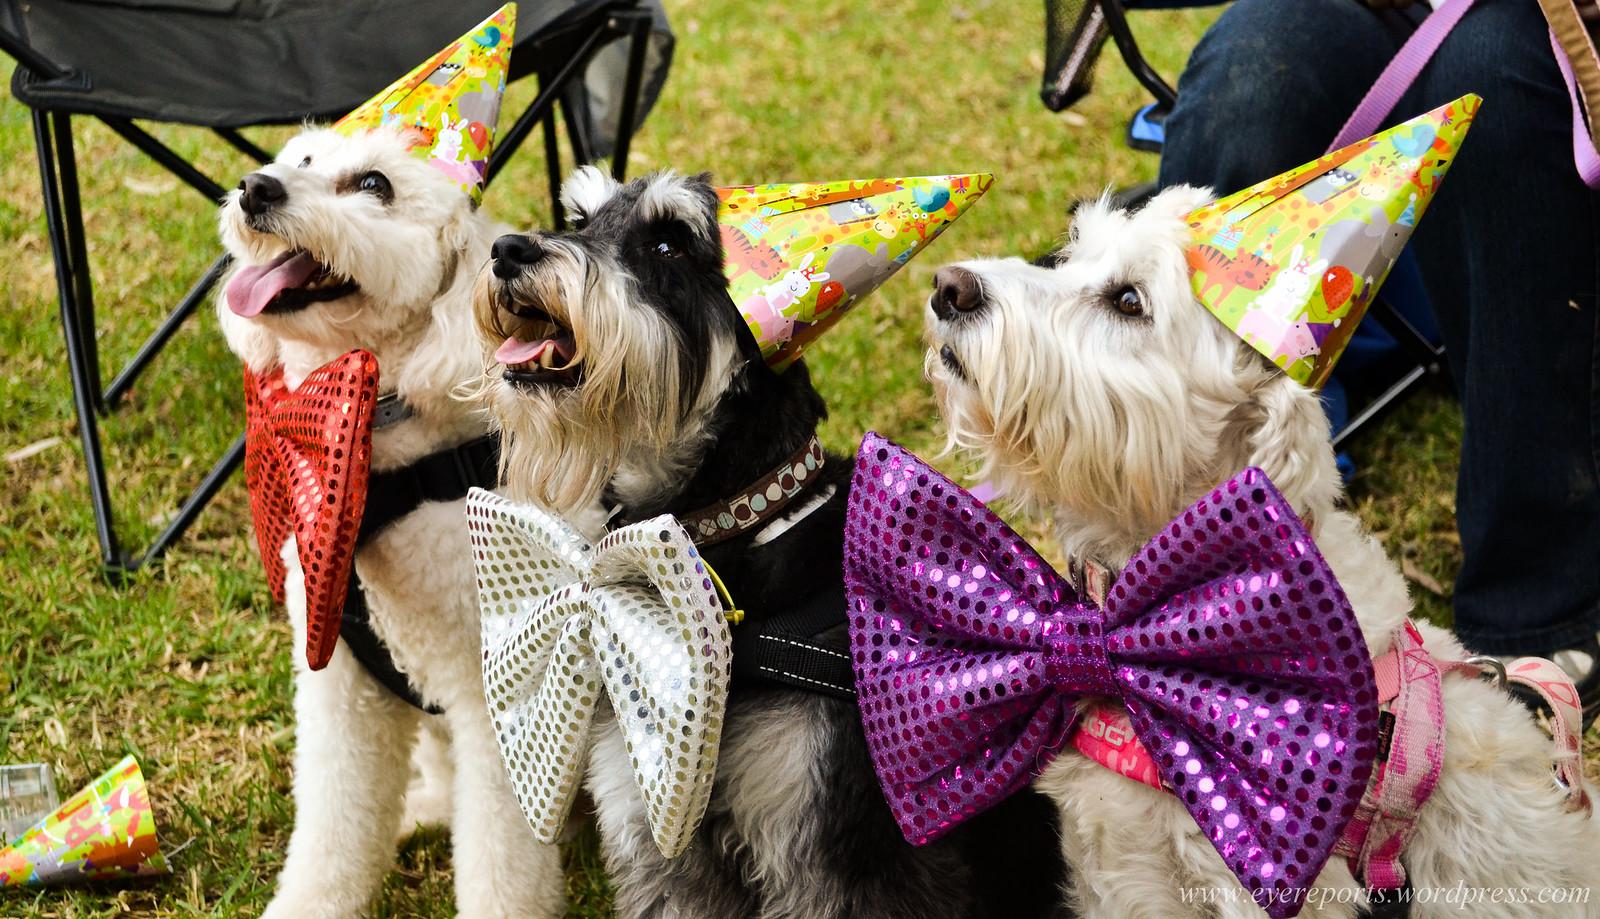 Birthdays at Puparazzi Day Spa